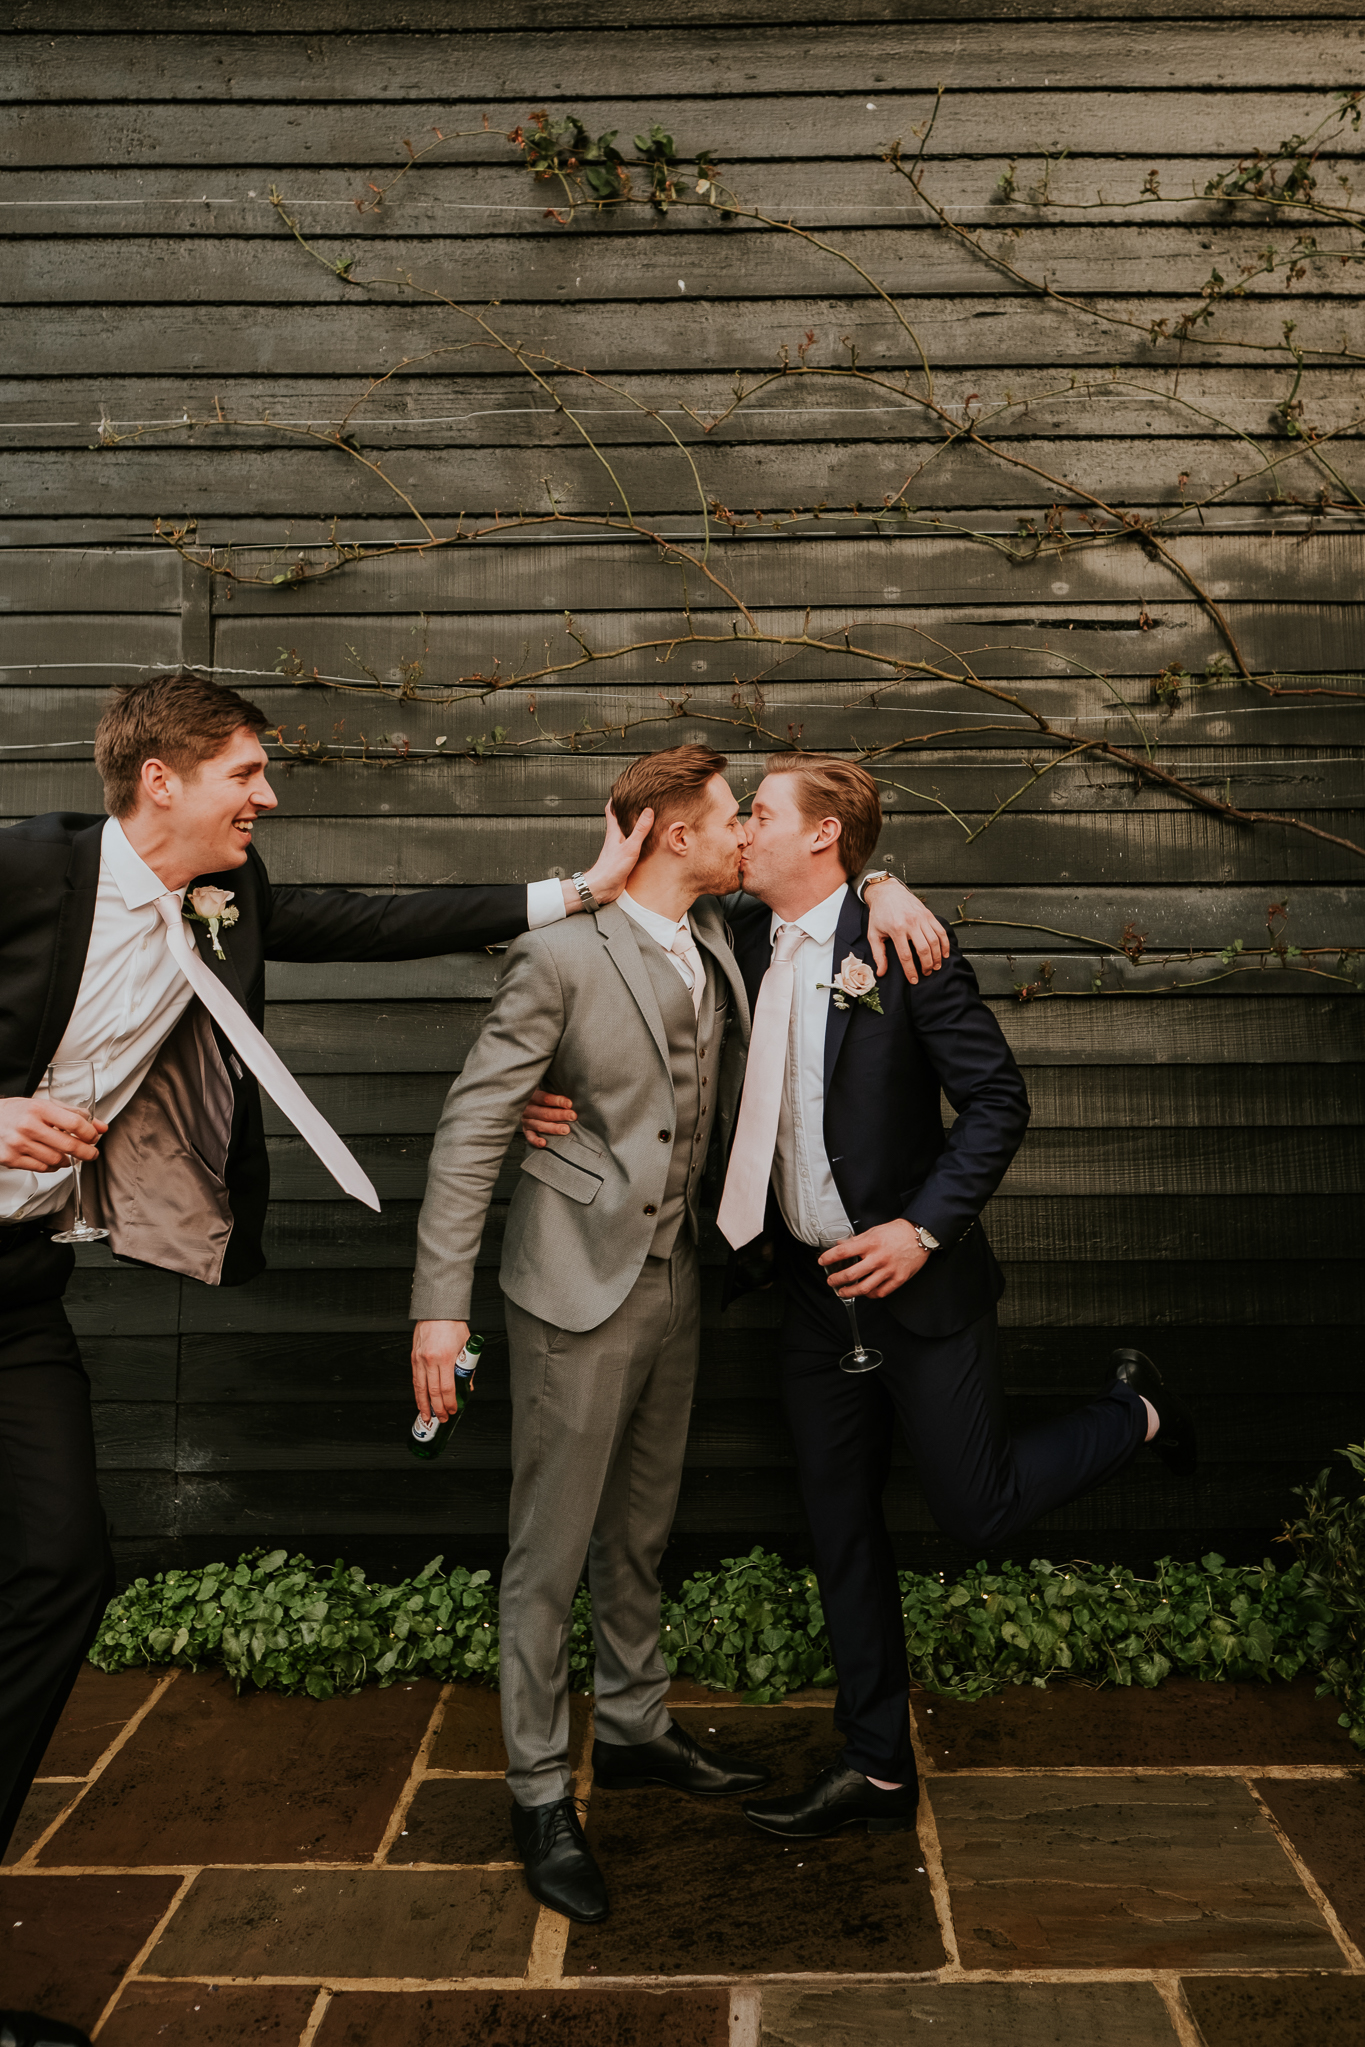 29 Upwaltham barn wedding photography creative joanna nicole photography2.jpg